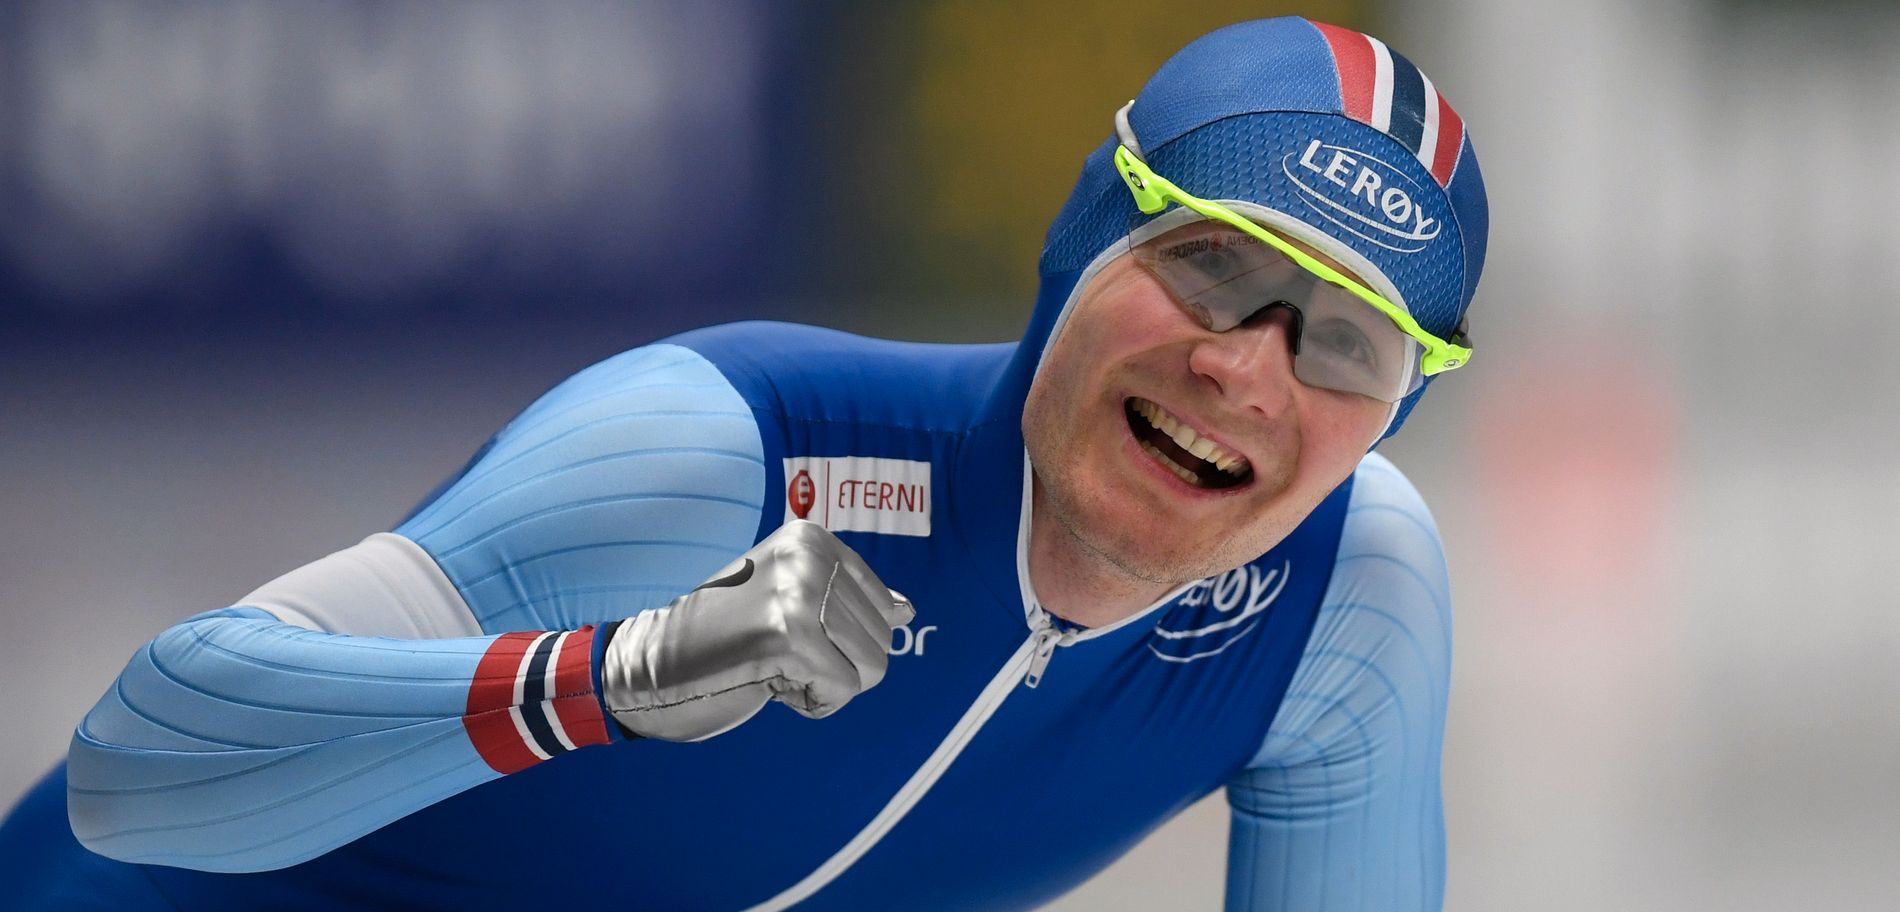 DEN SATT! Sverre Lunde Pedersen var så glad rett etter målpassering.